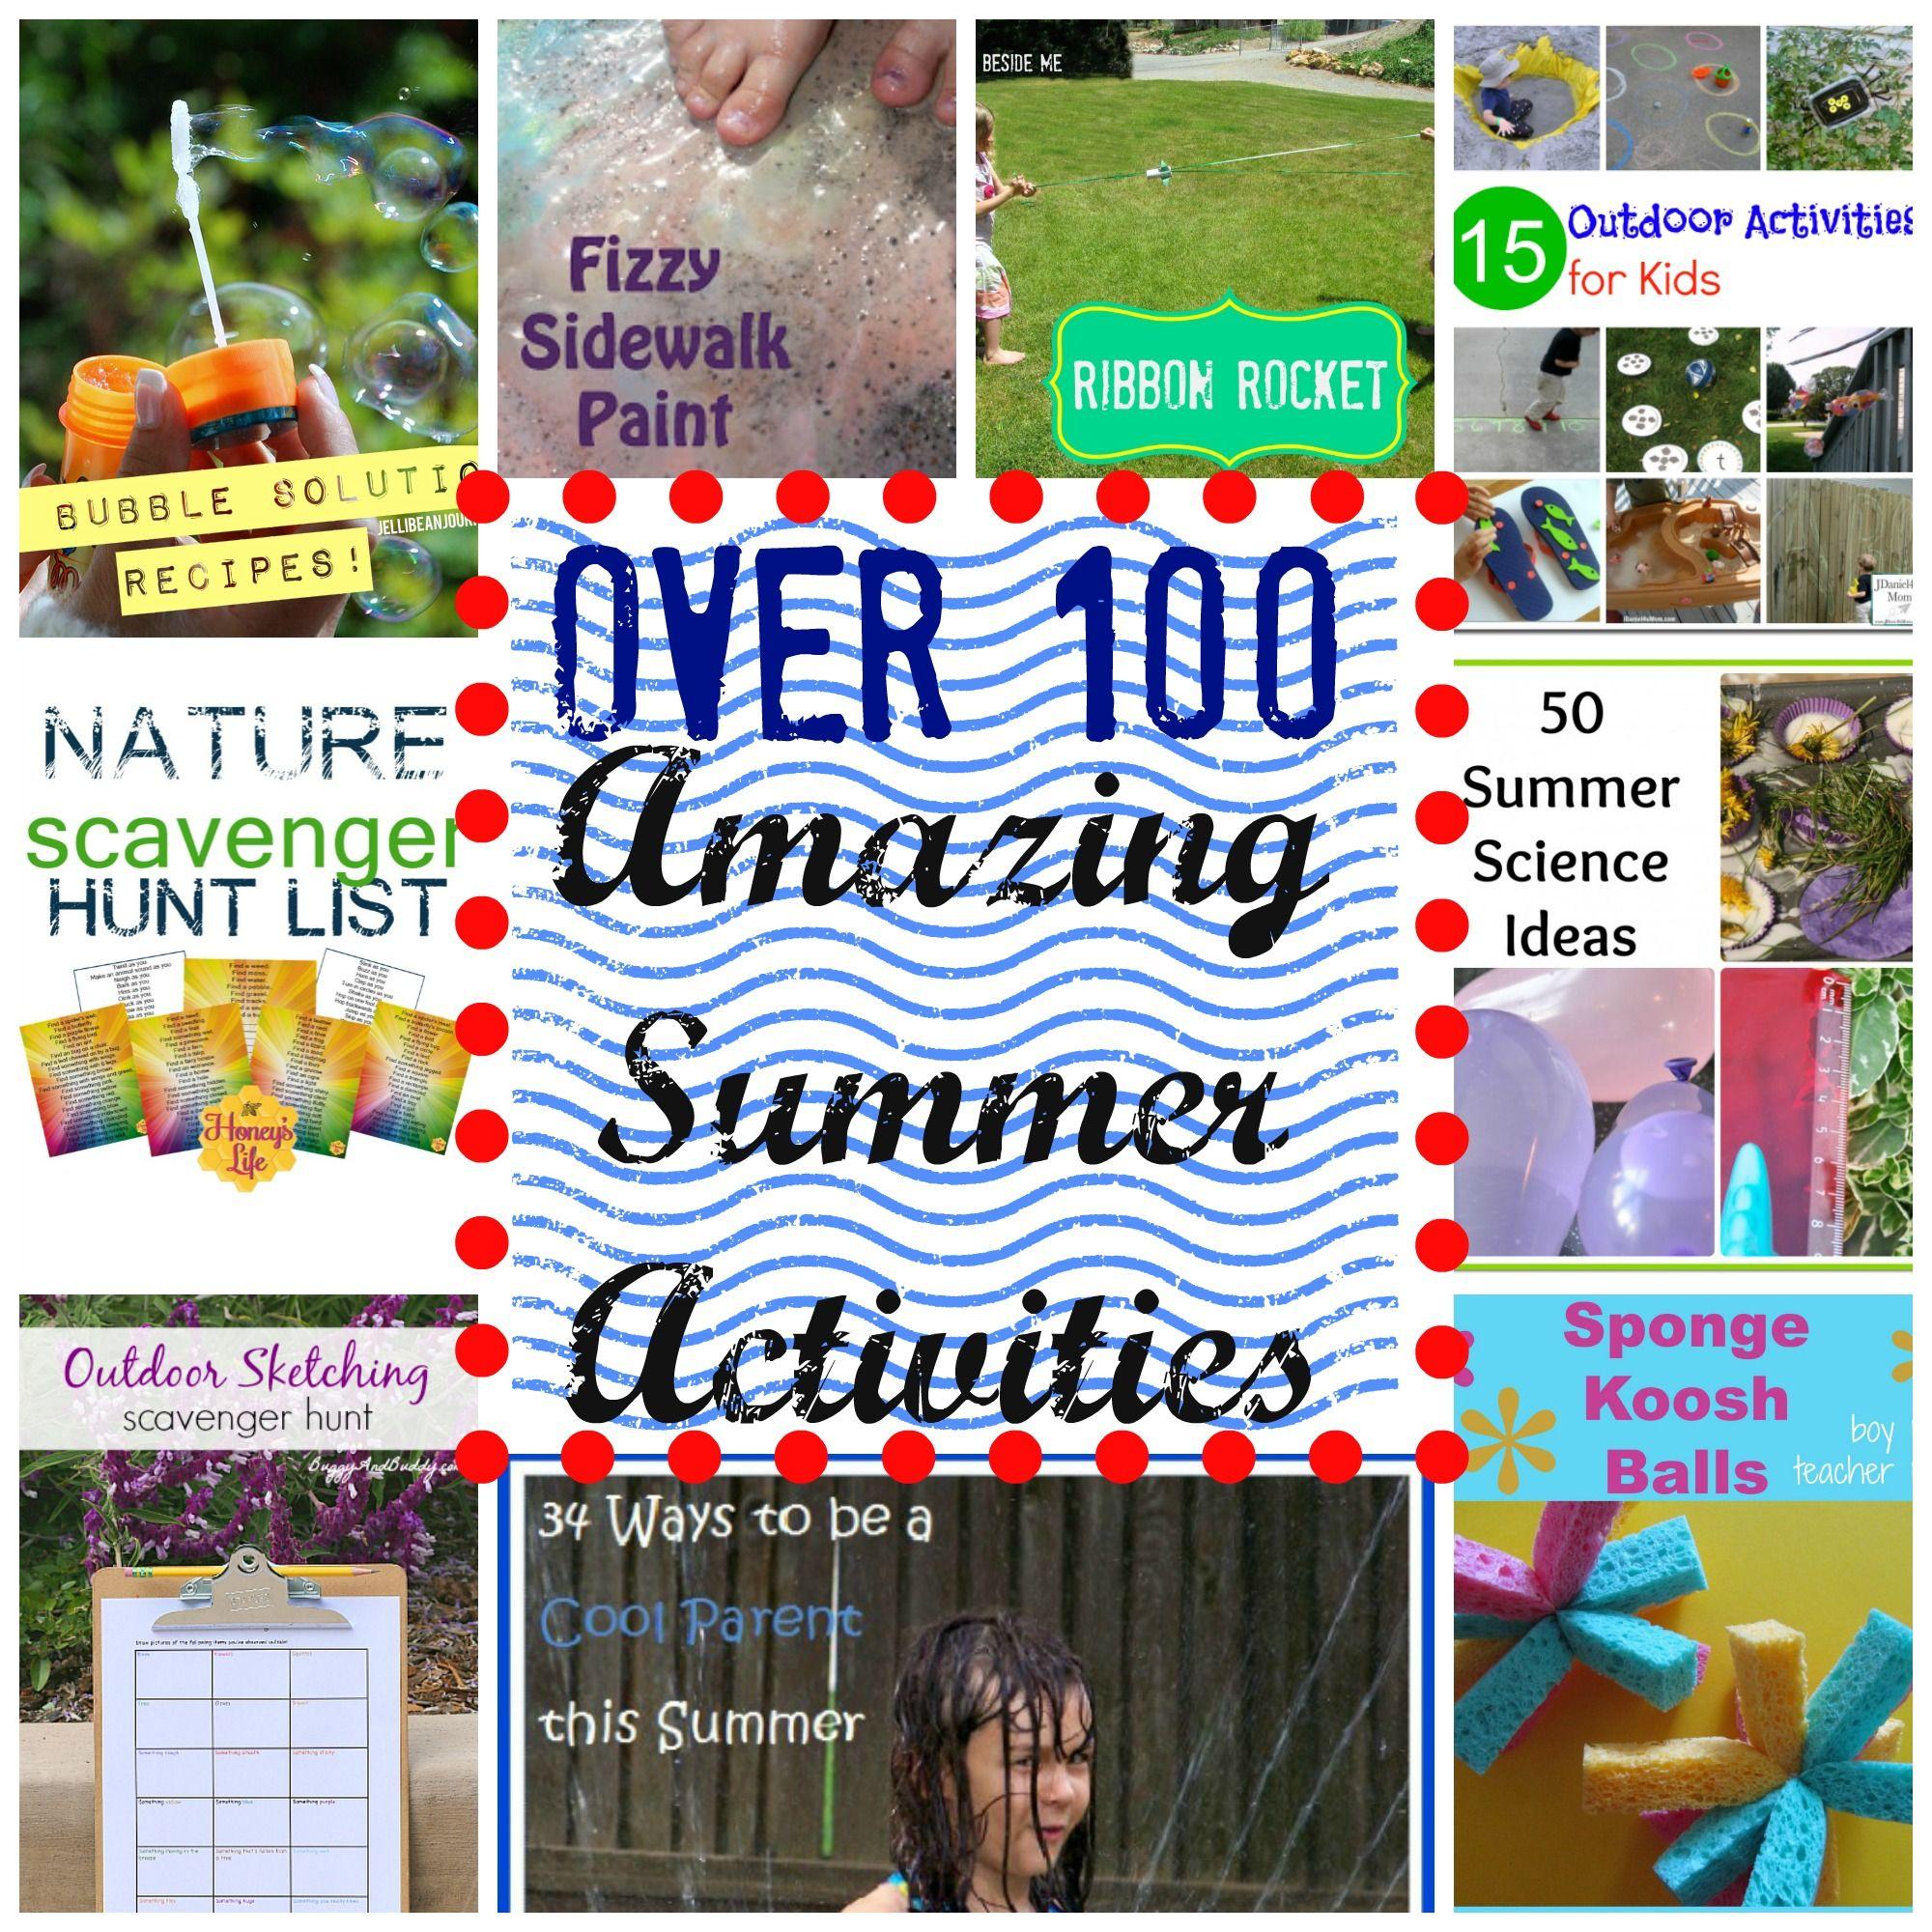 Over 100 Fun Outdoor Activities for Kids During Summer